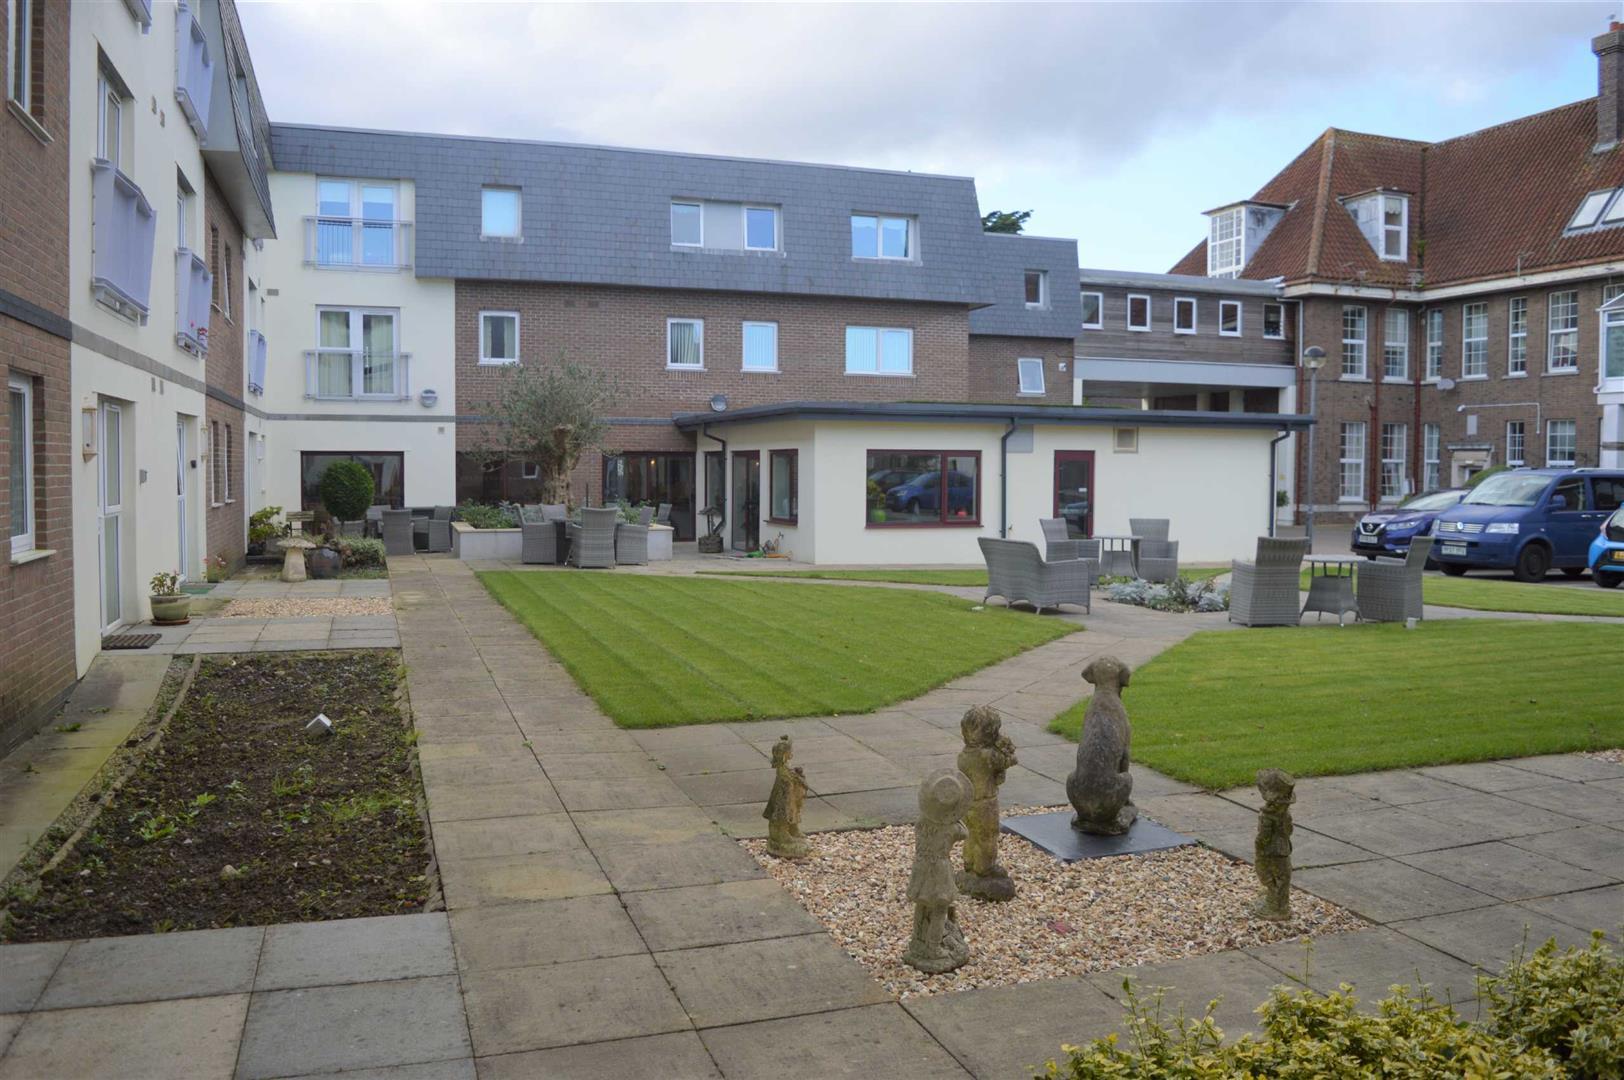 Willow Court, Clyne Common, Swansea, SA3 3JB